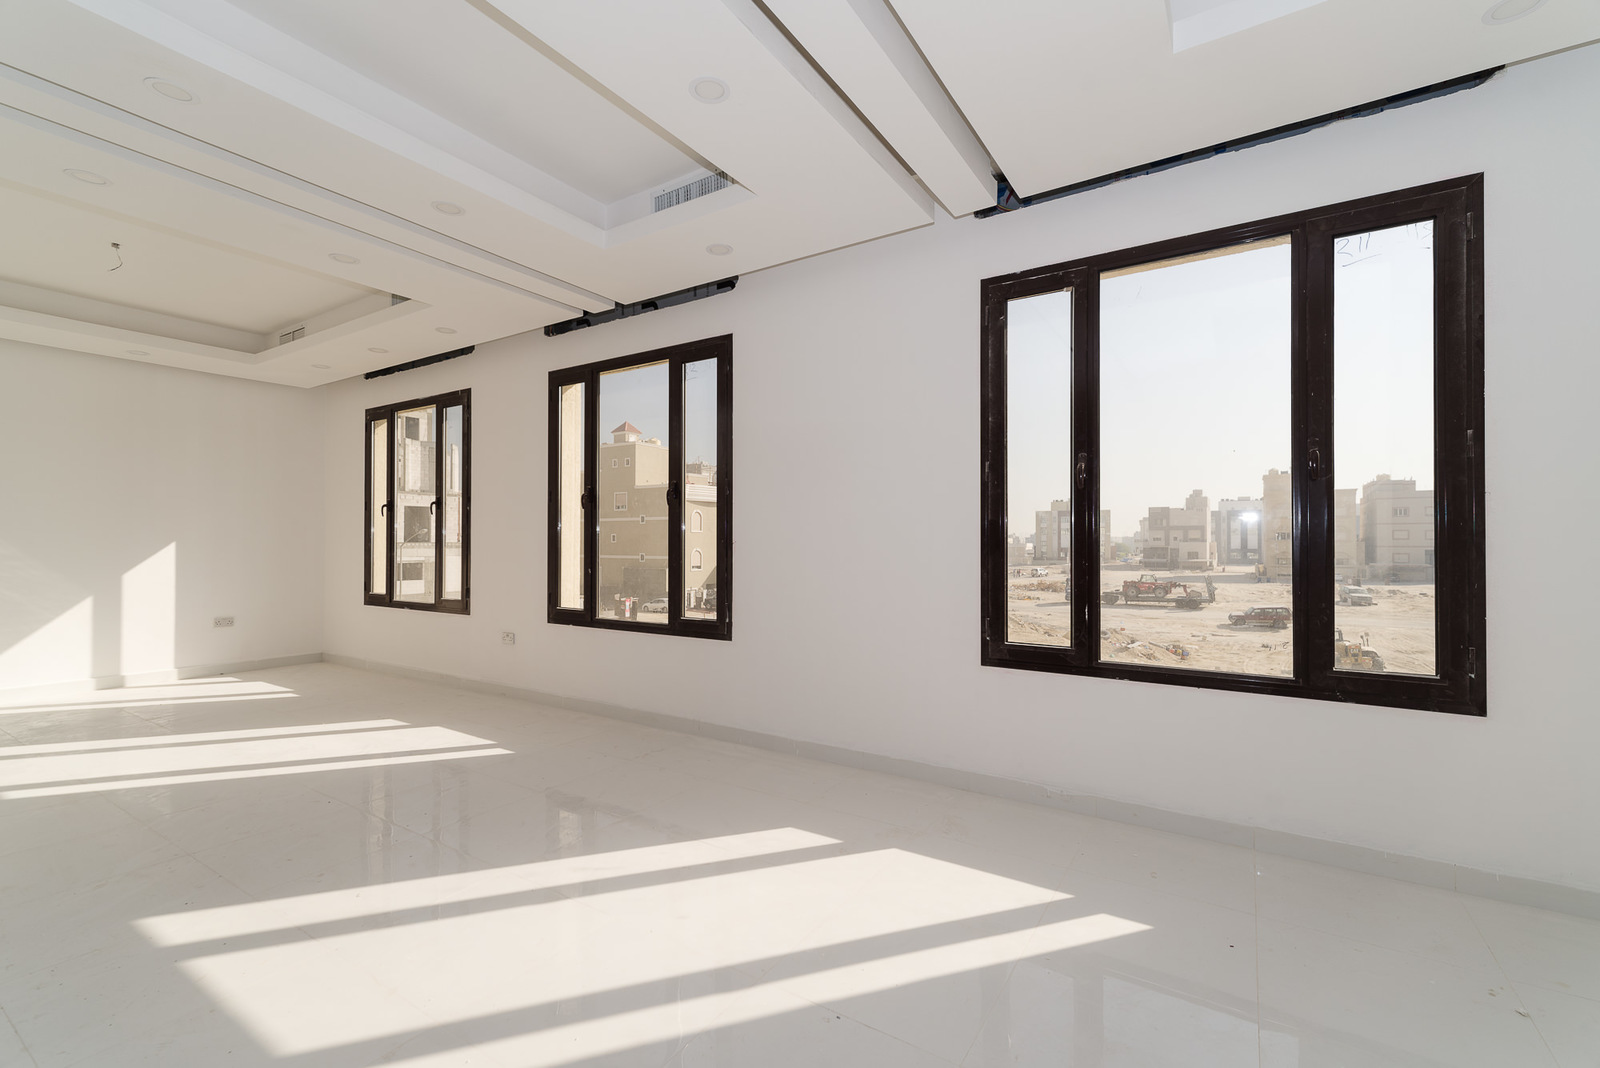 Fnaitees – new, spacious, unfurnished, four bedroom floors